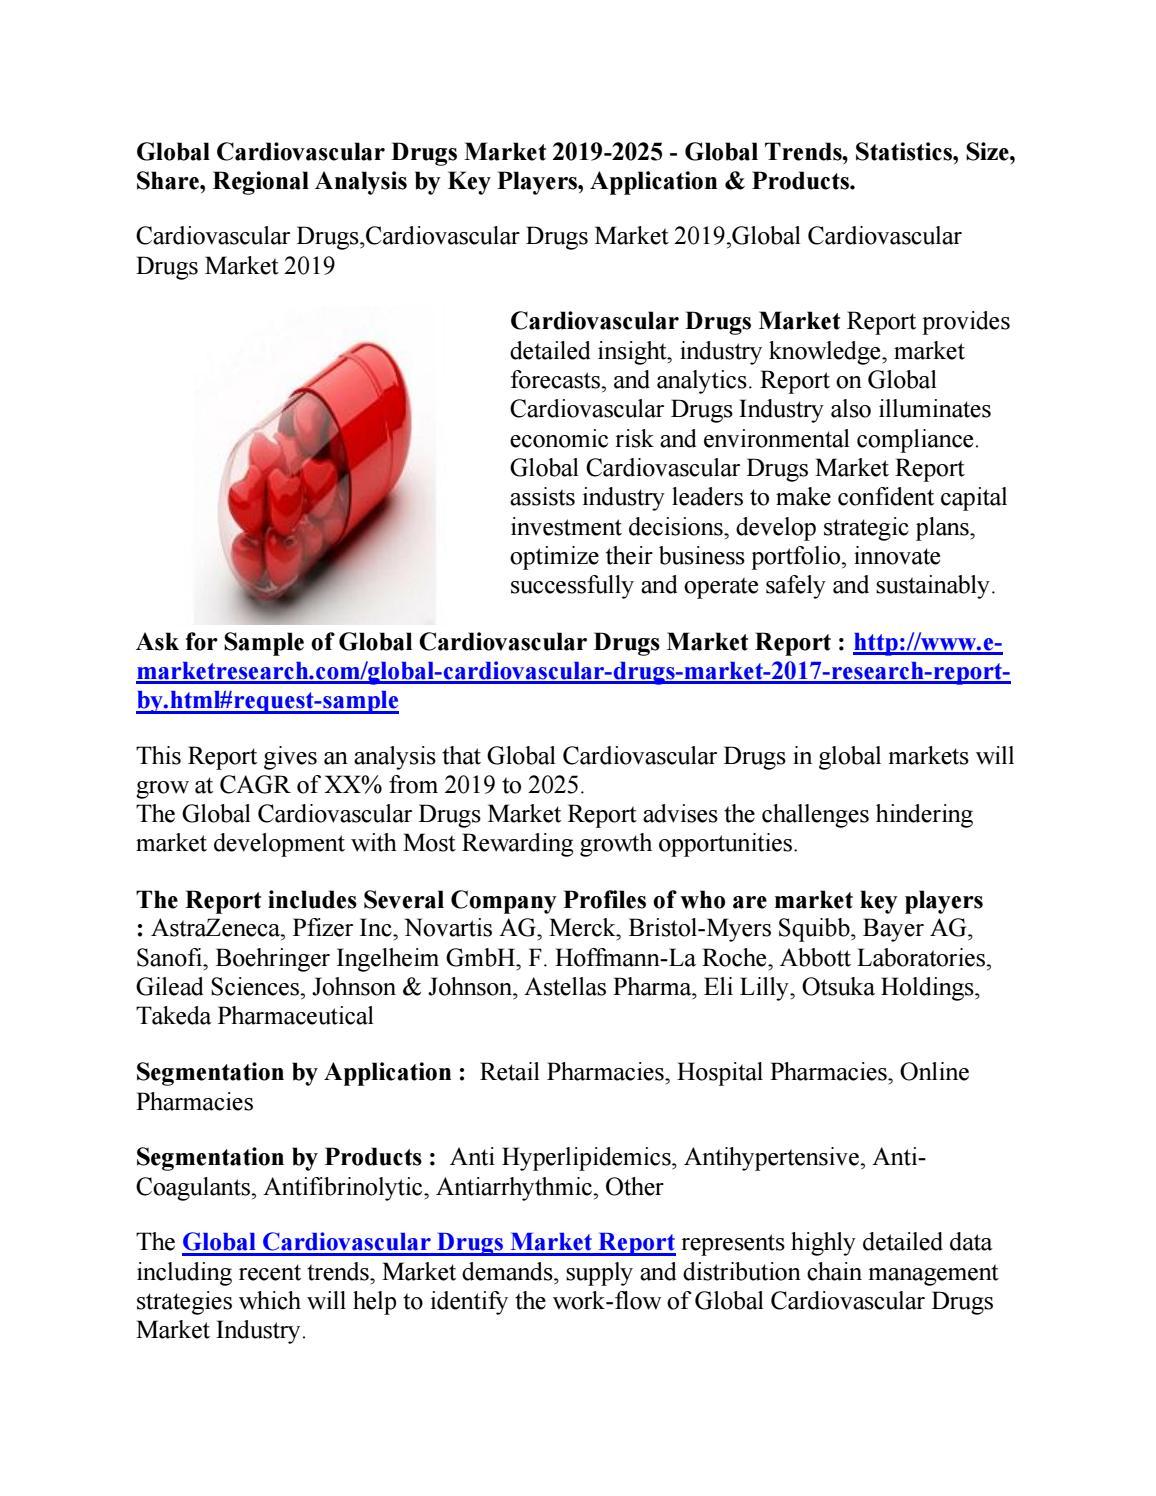 Global Cardiovascular Drugs Market 2019-2025 - Global Trends